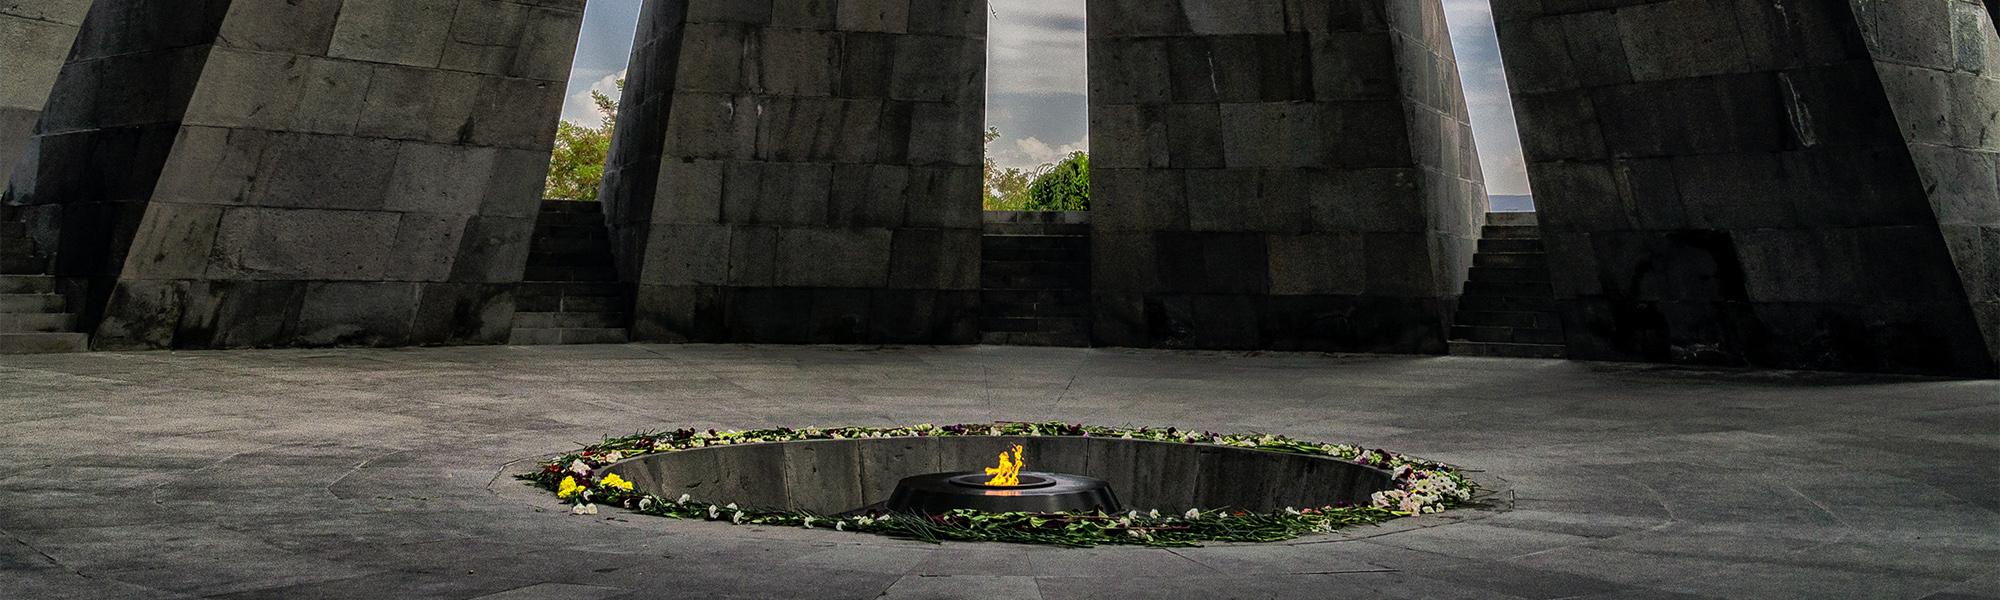 armenian eternal flame